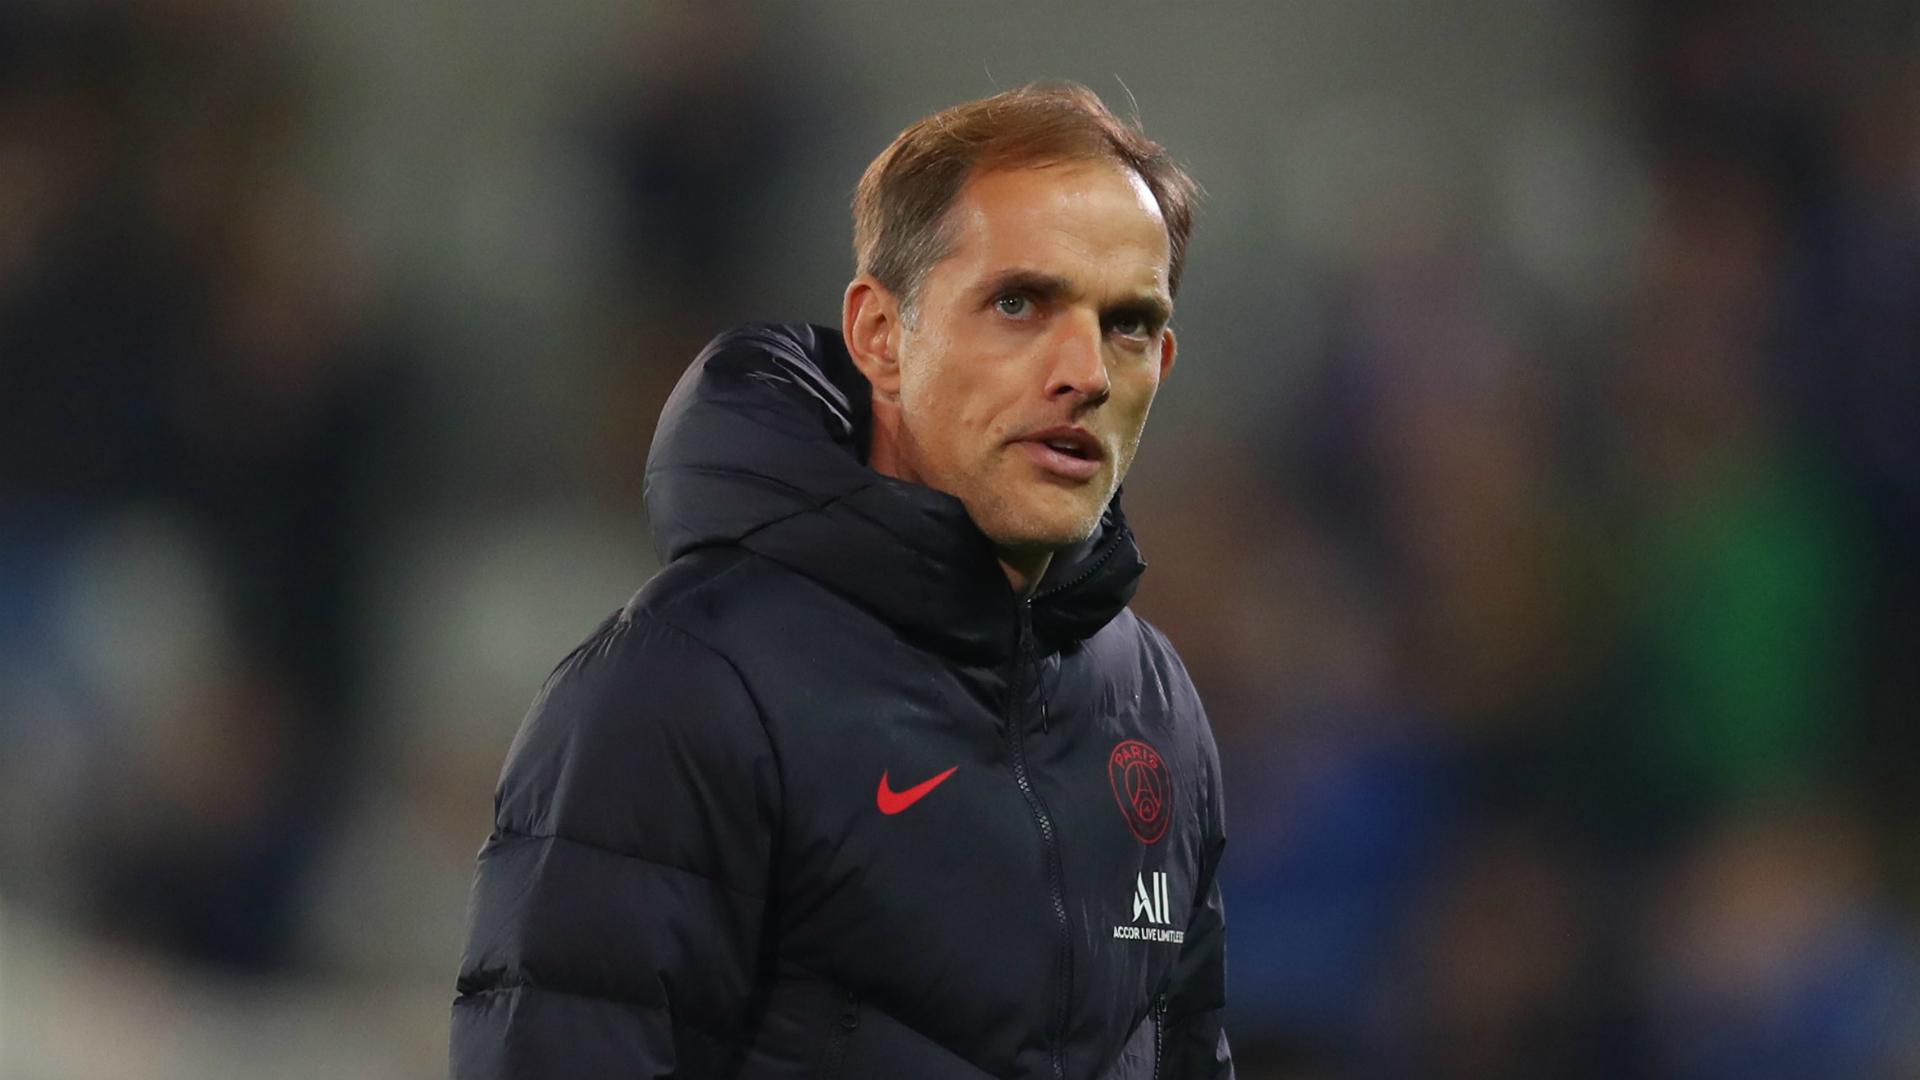 Paris Saint-Germain did not deserve any luck against Dijon, says Tuchel